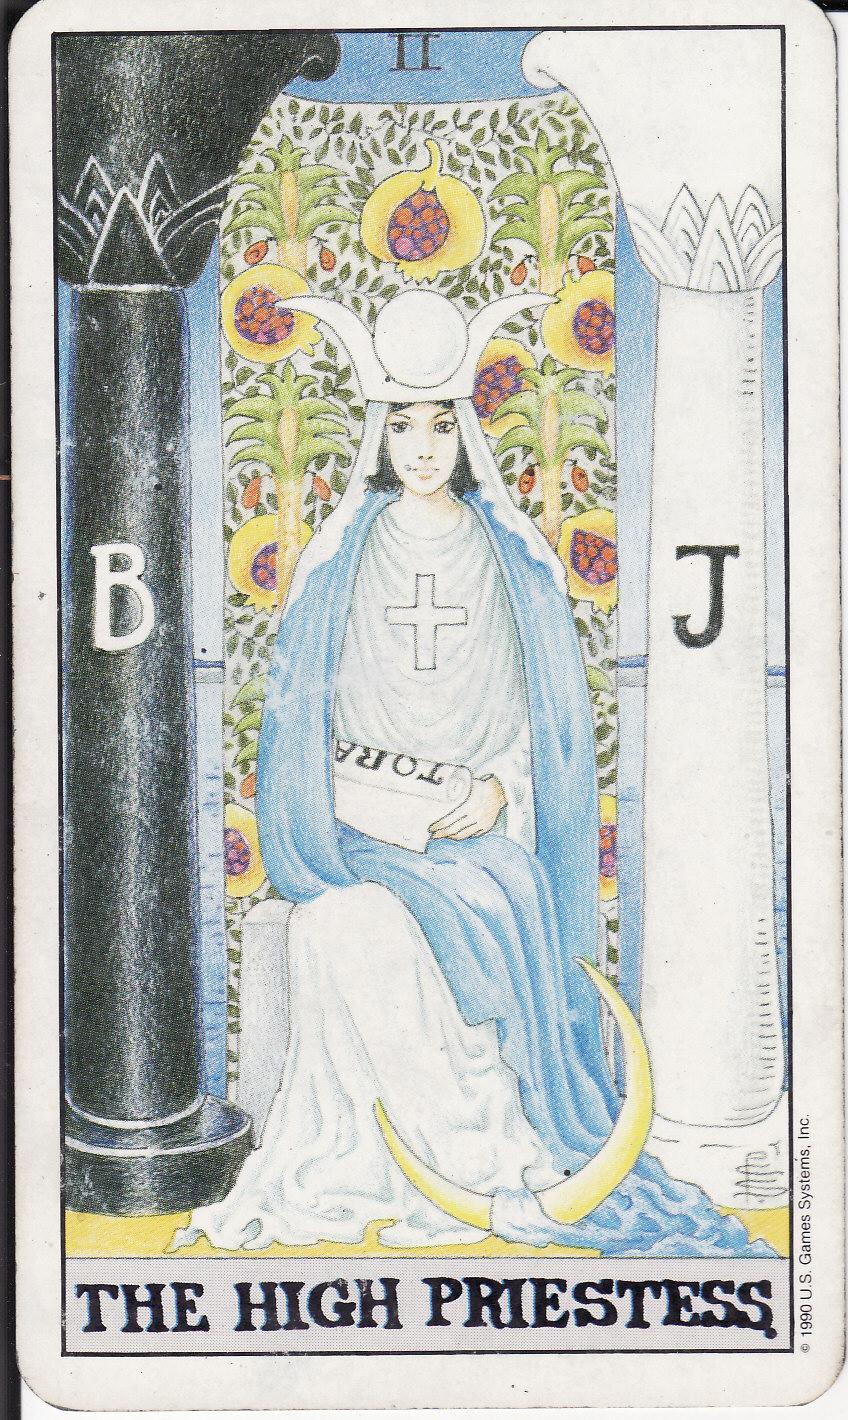 TAROT - The Royal Road: 2 THE HIGH PRIESTESS II